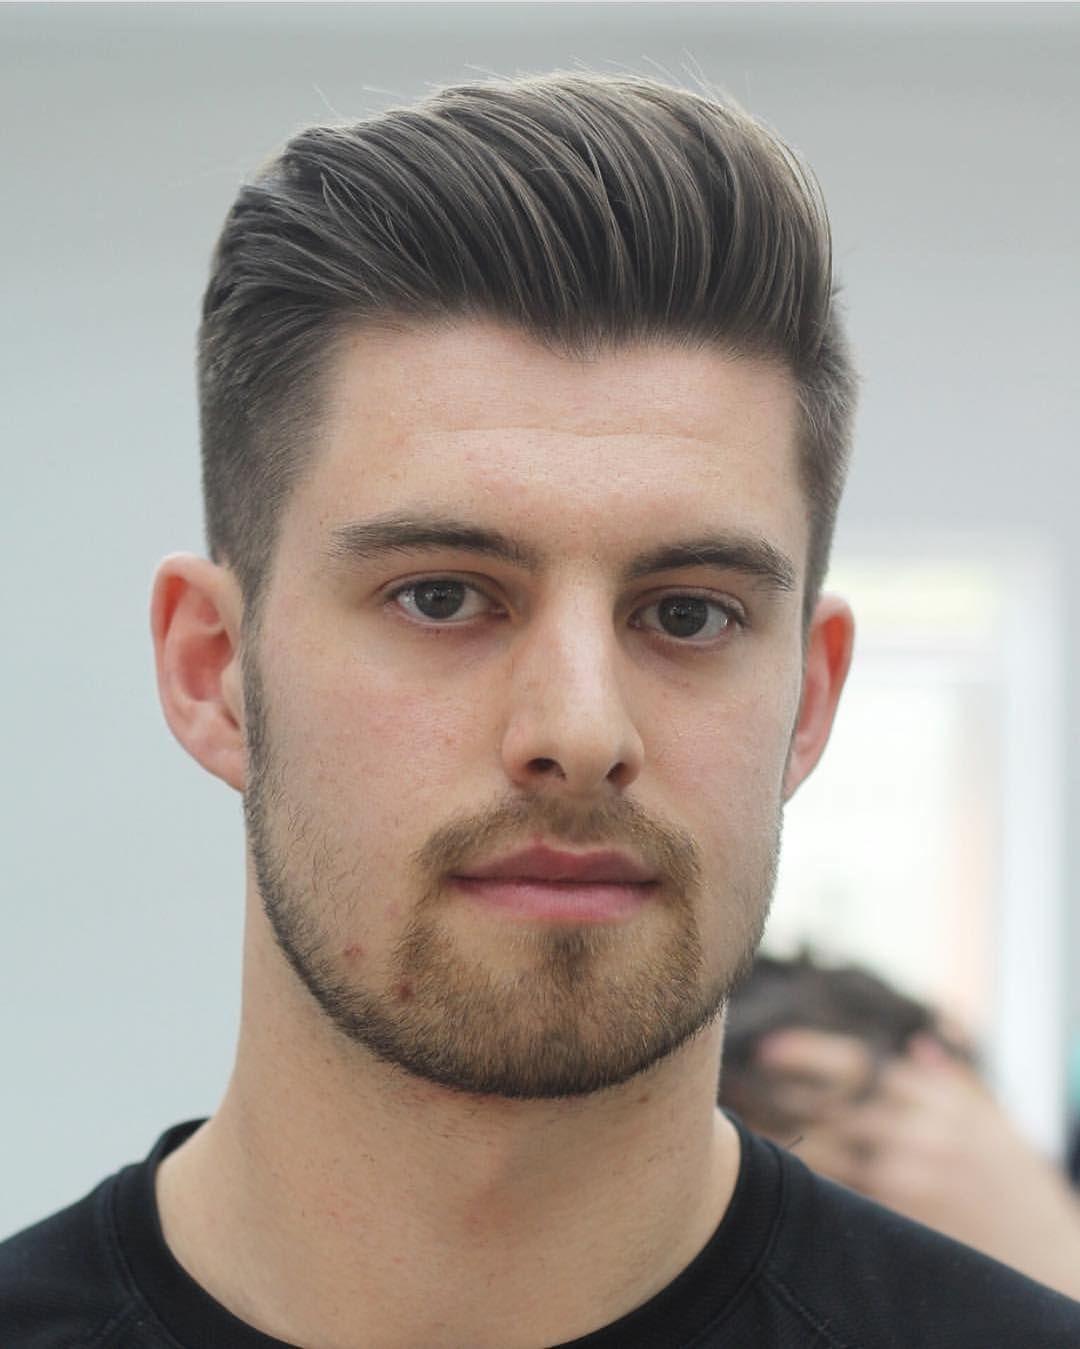 Pin by radu on freza pinterest haircuts hair style and men